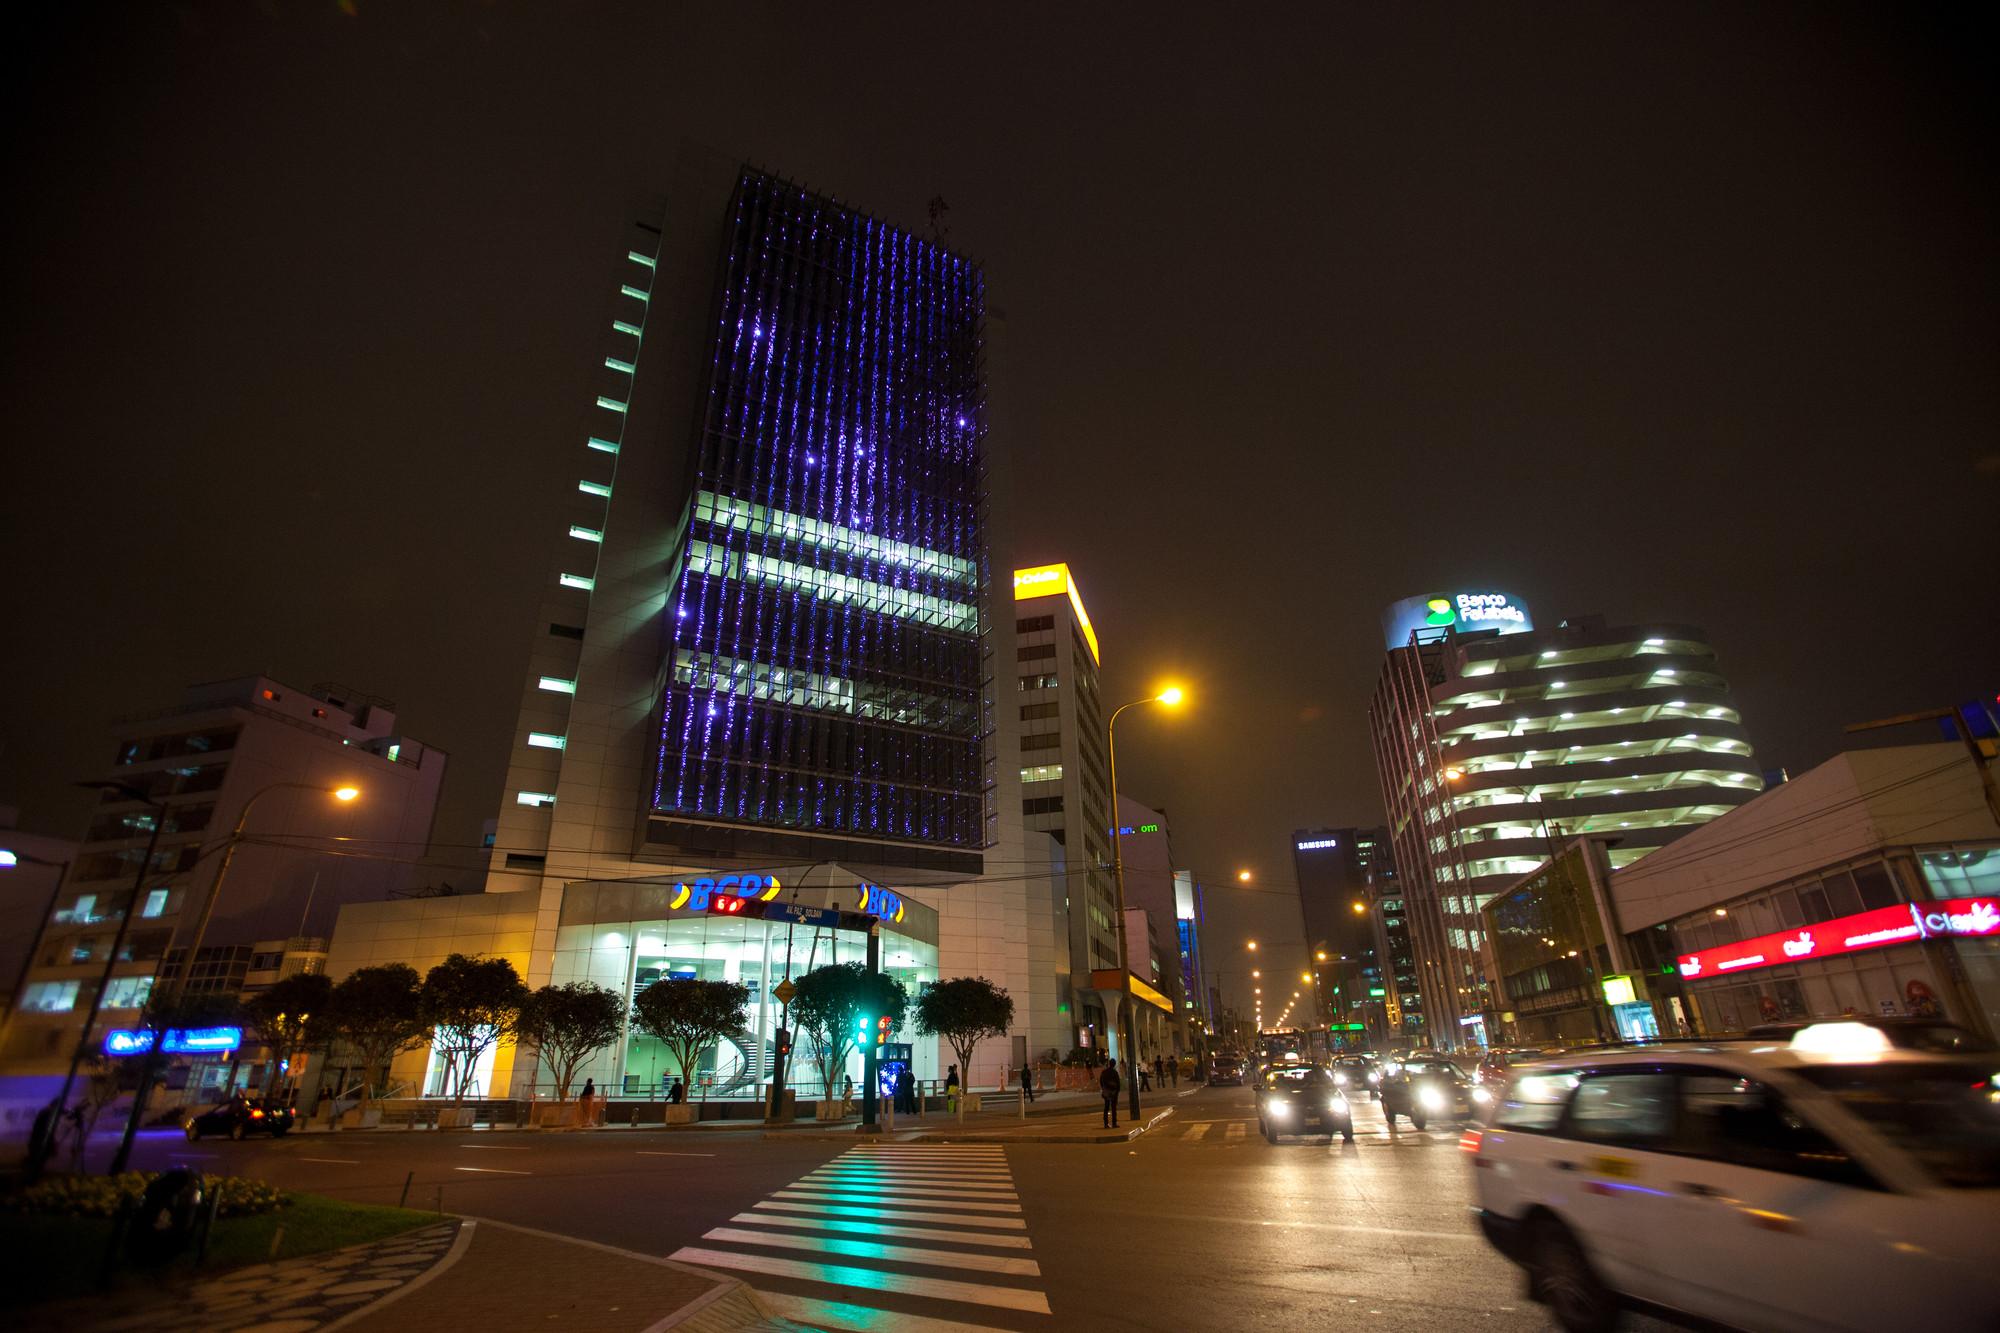 Instalación de Iluminación: Affinity, una mezcla interactiva entre arte e iluminación - Edificio BCP